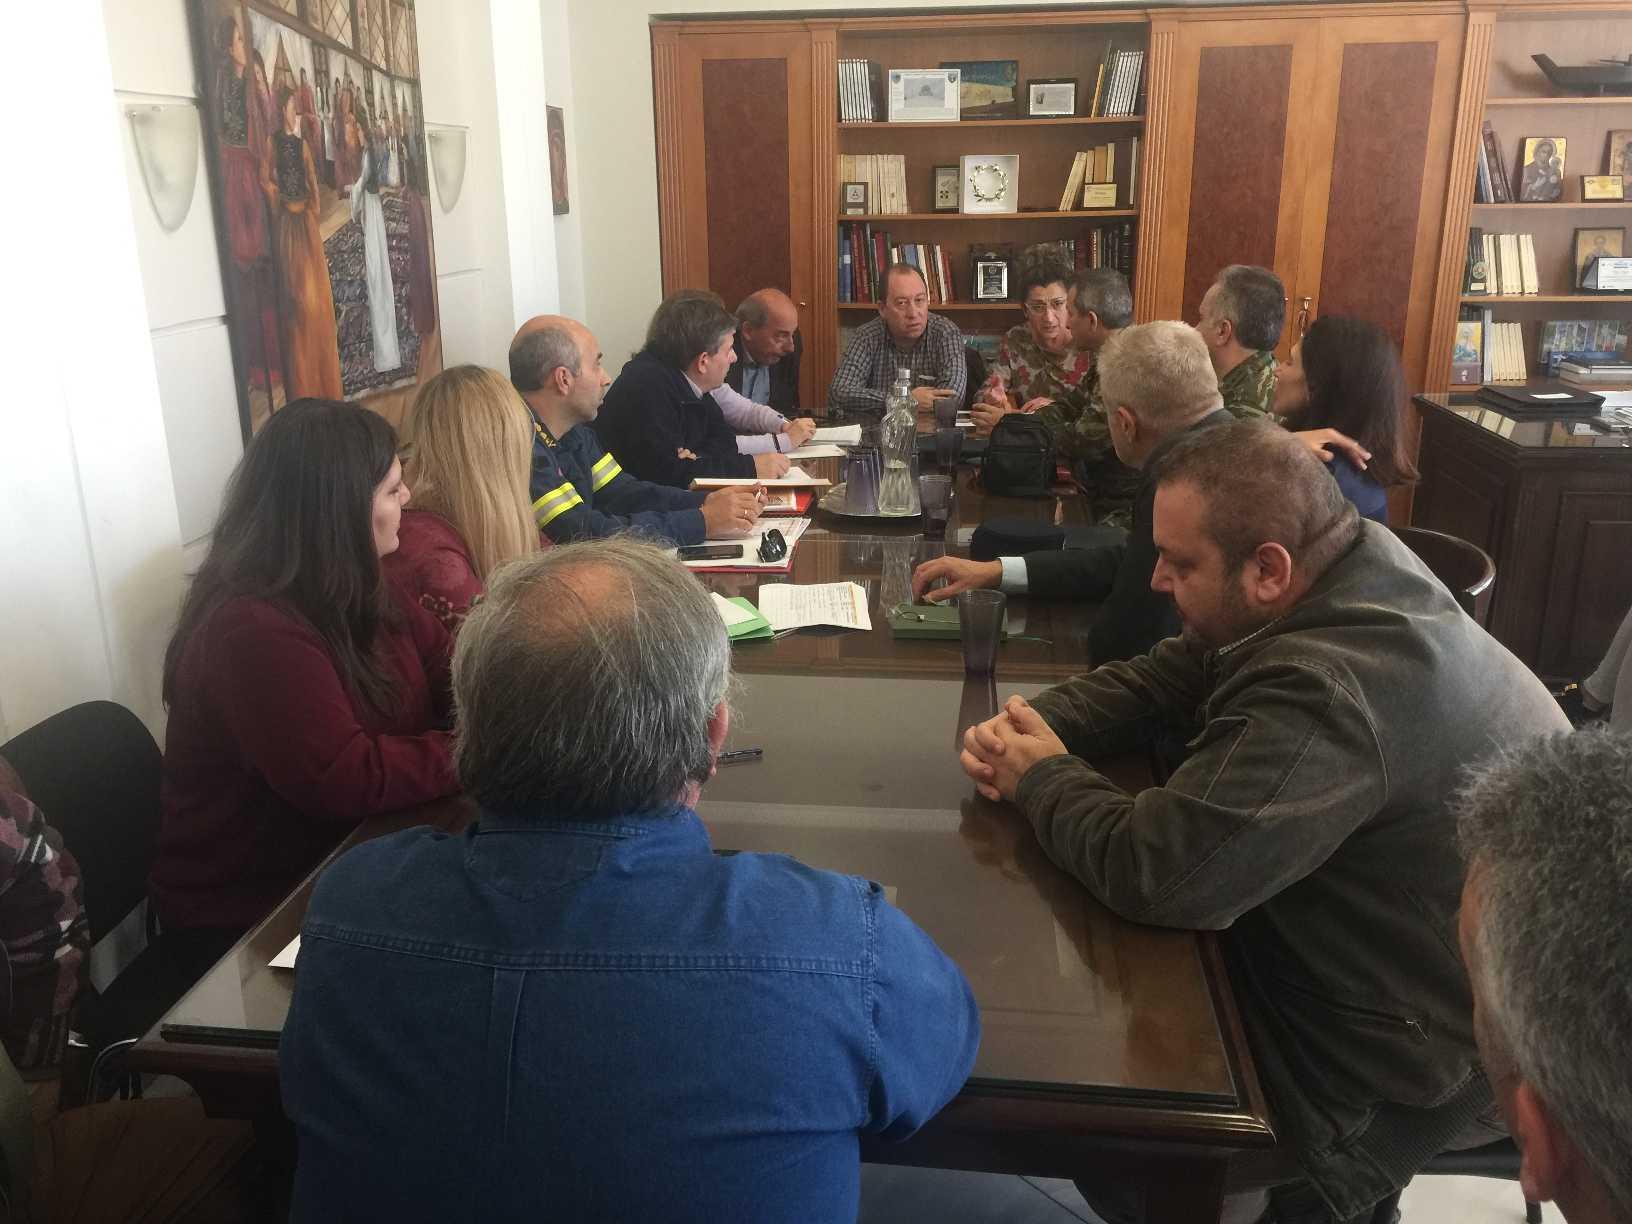 d4521072e69d Συνεδρίασε το Συντονιστικό Όργανο Πολιτικής Προστασίας της Π.Ε. Καστοριάς -  Φωνή της Καστοριάς